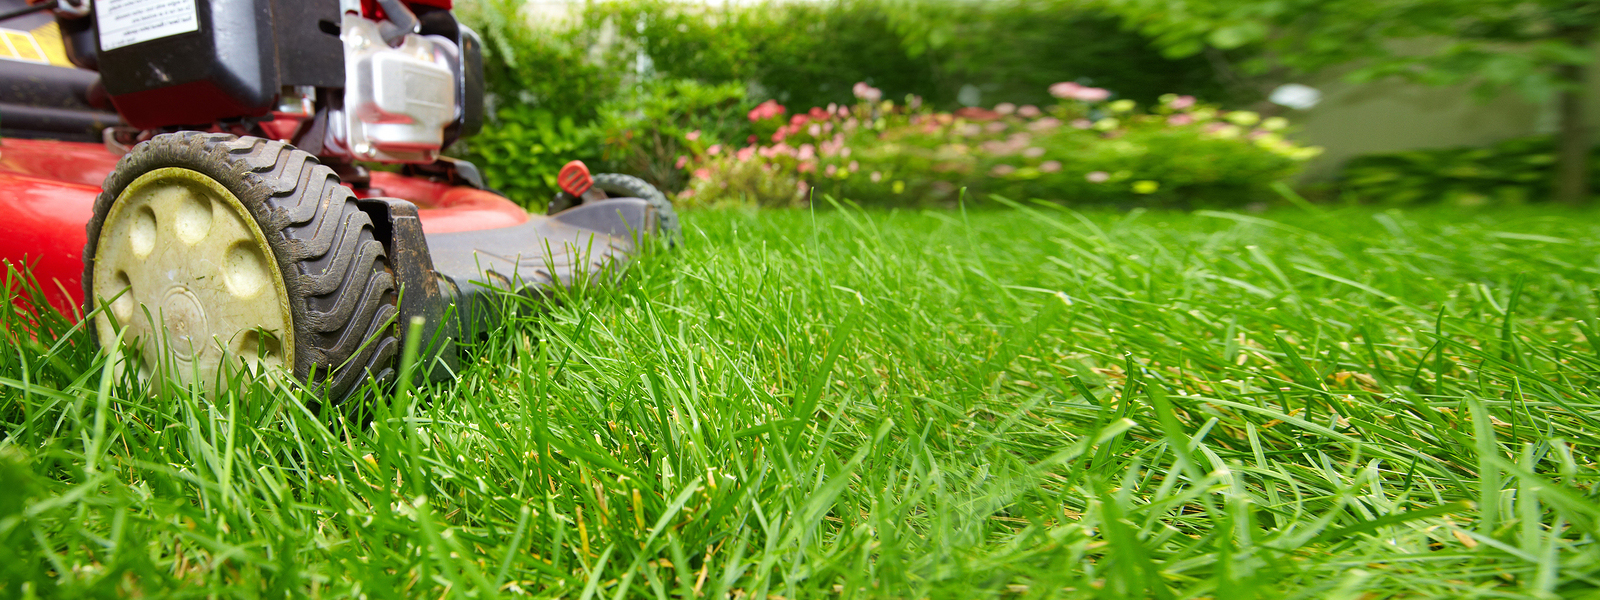 bigstock-Lawn-mower-182258899.jpg